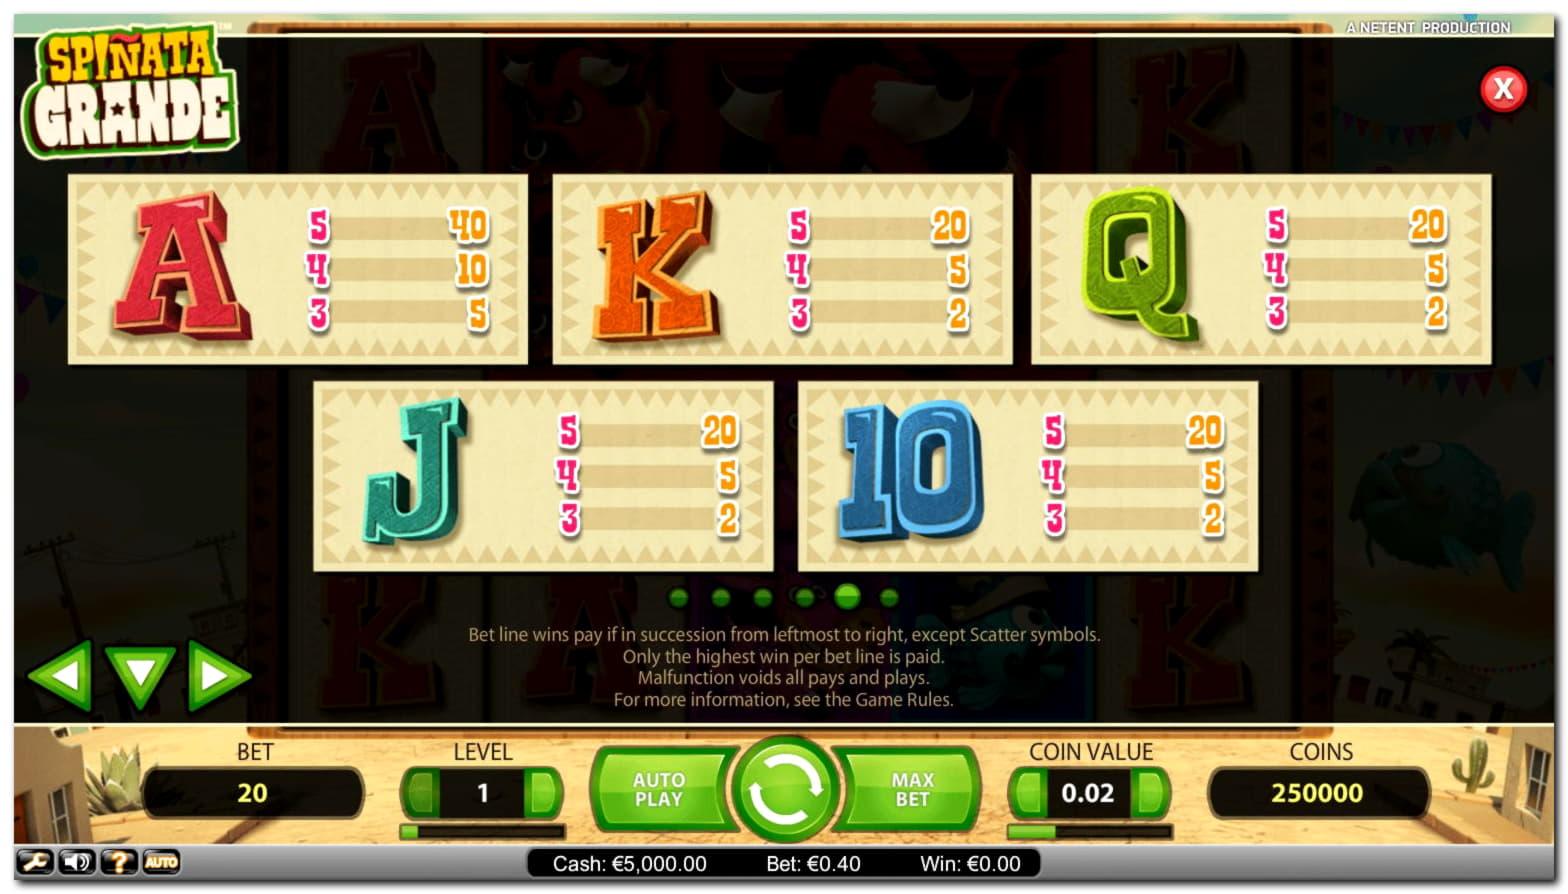 Europa Casinoの$ 115無料カジノチップ